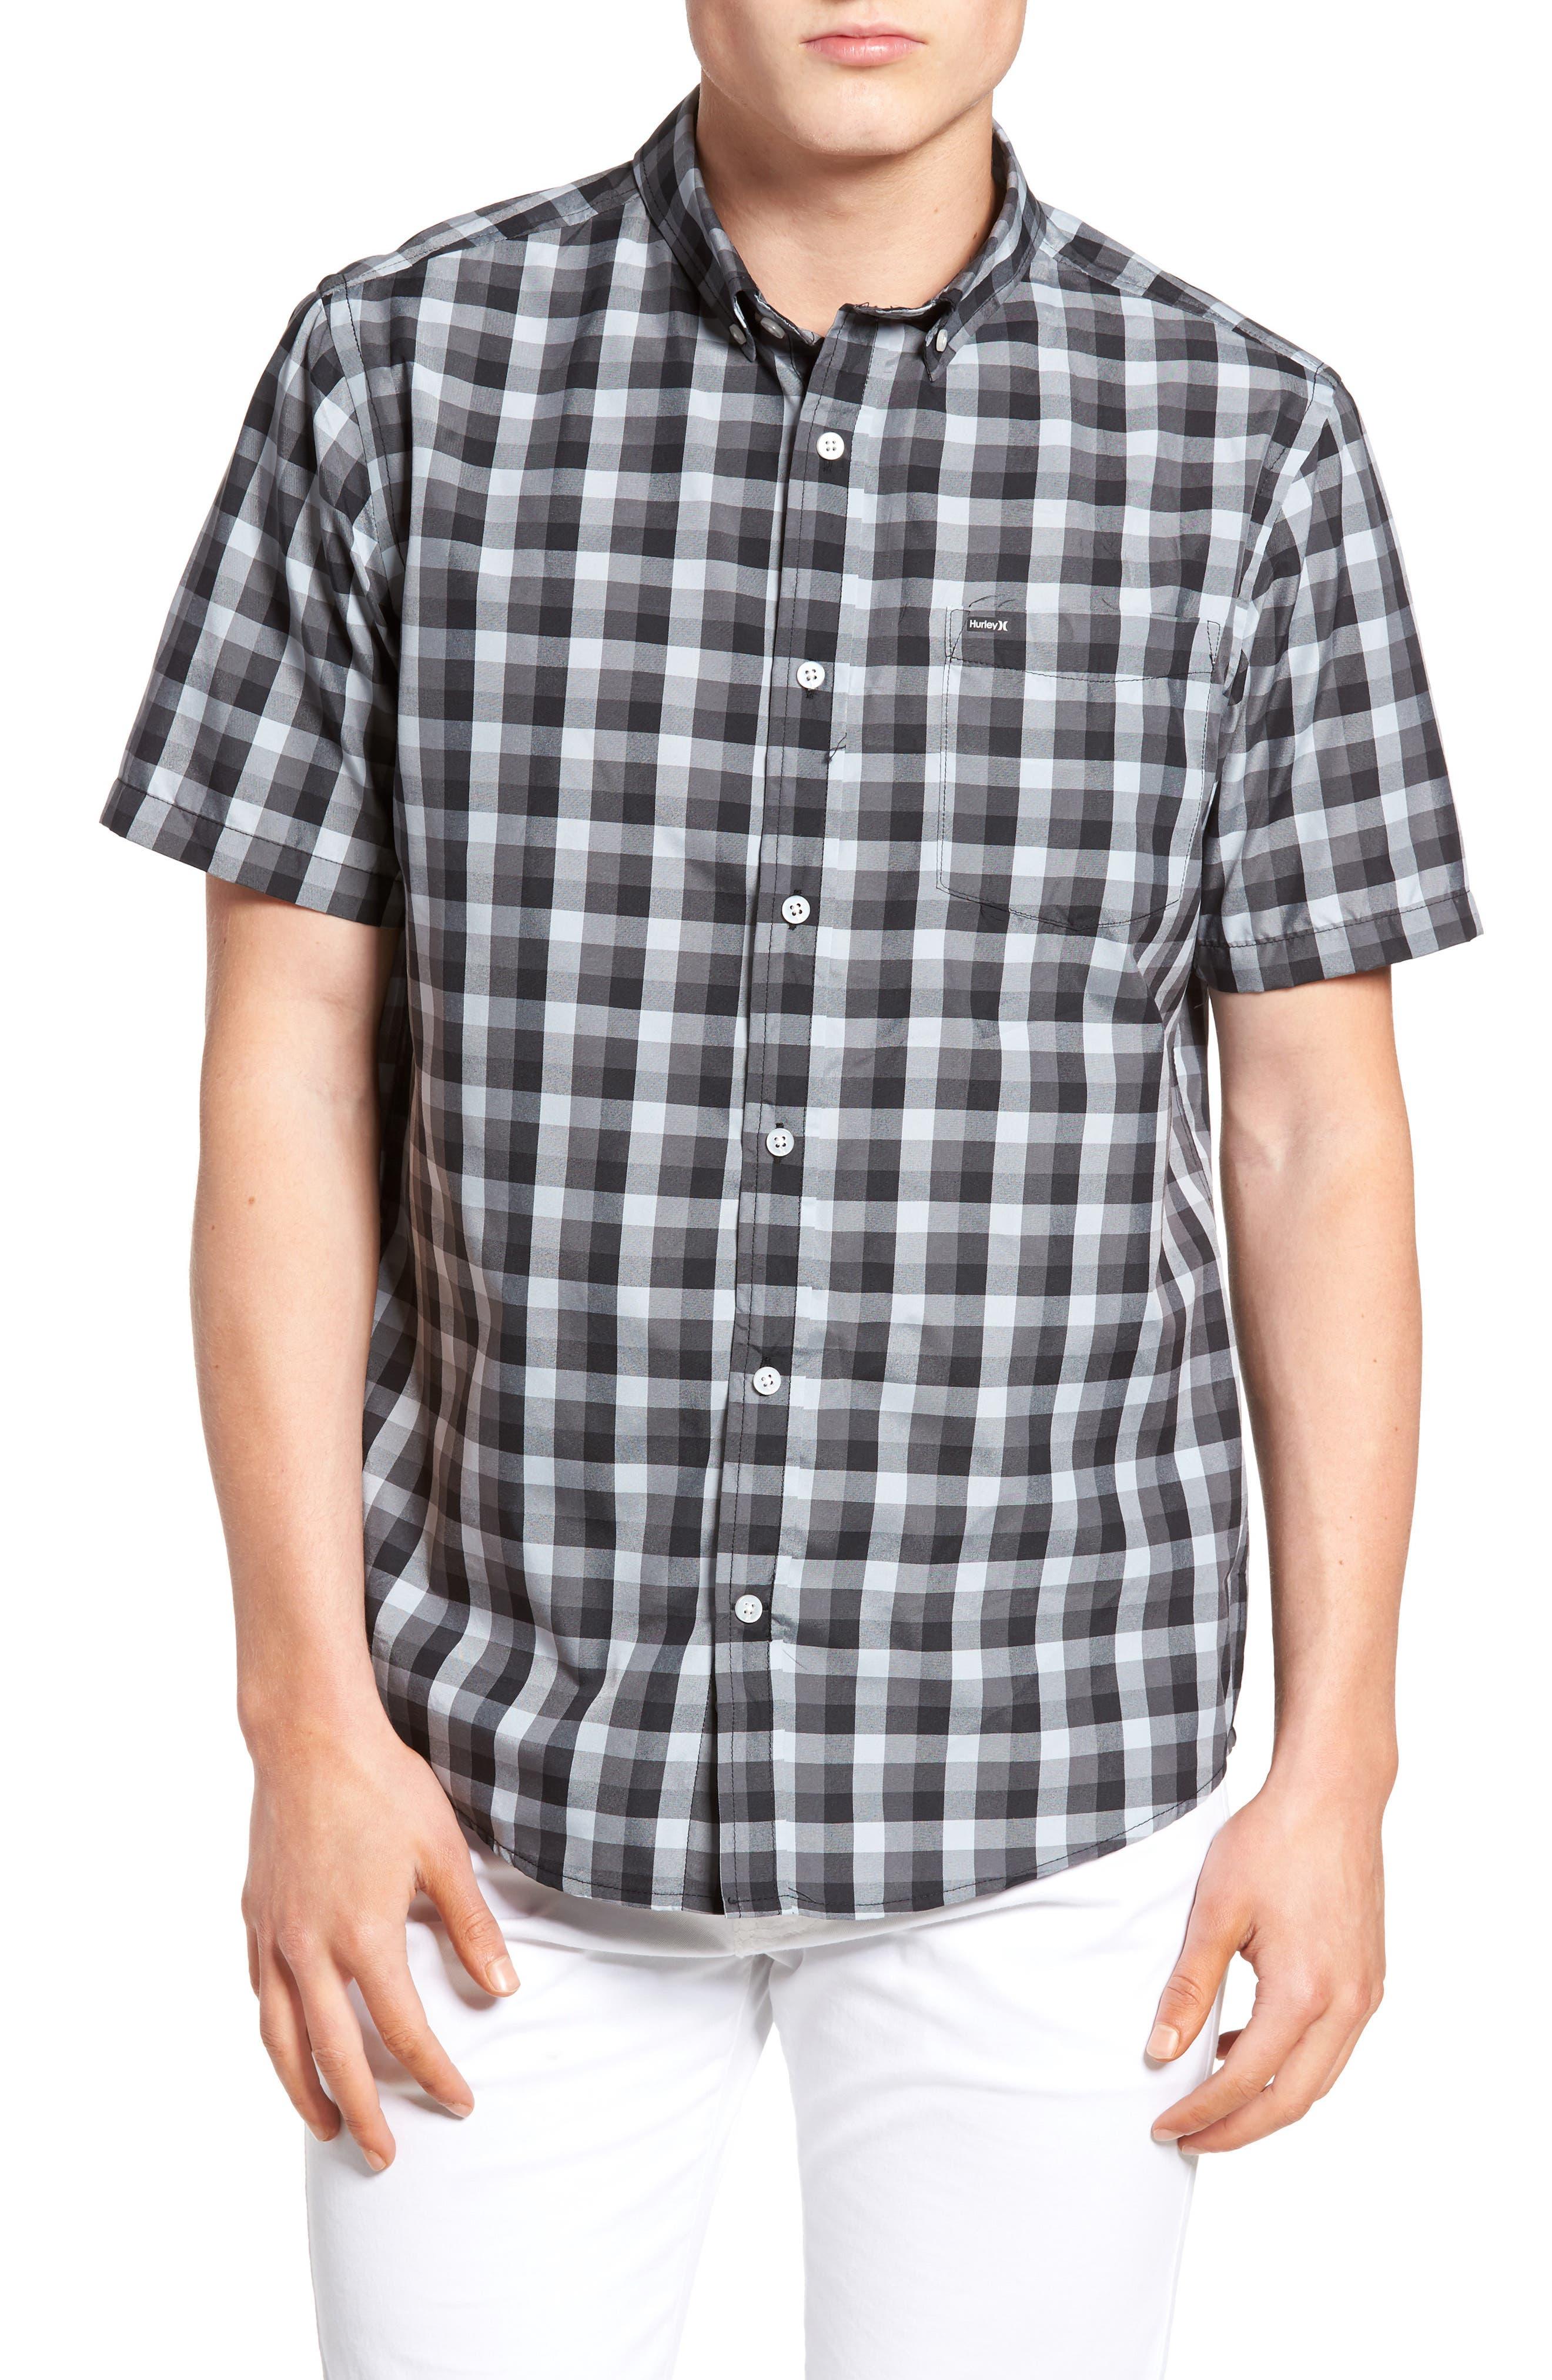 Hurley Havoc Dri-FIT Plaid Woven Shirt